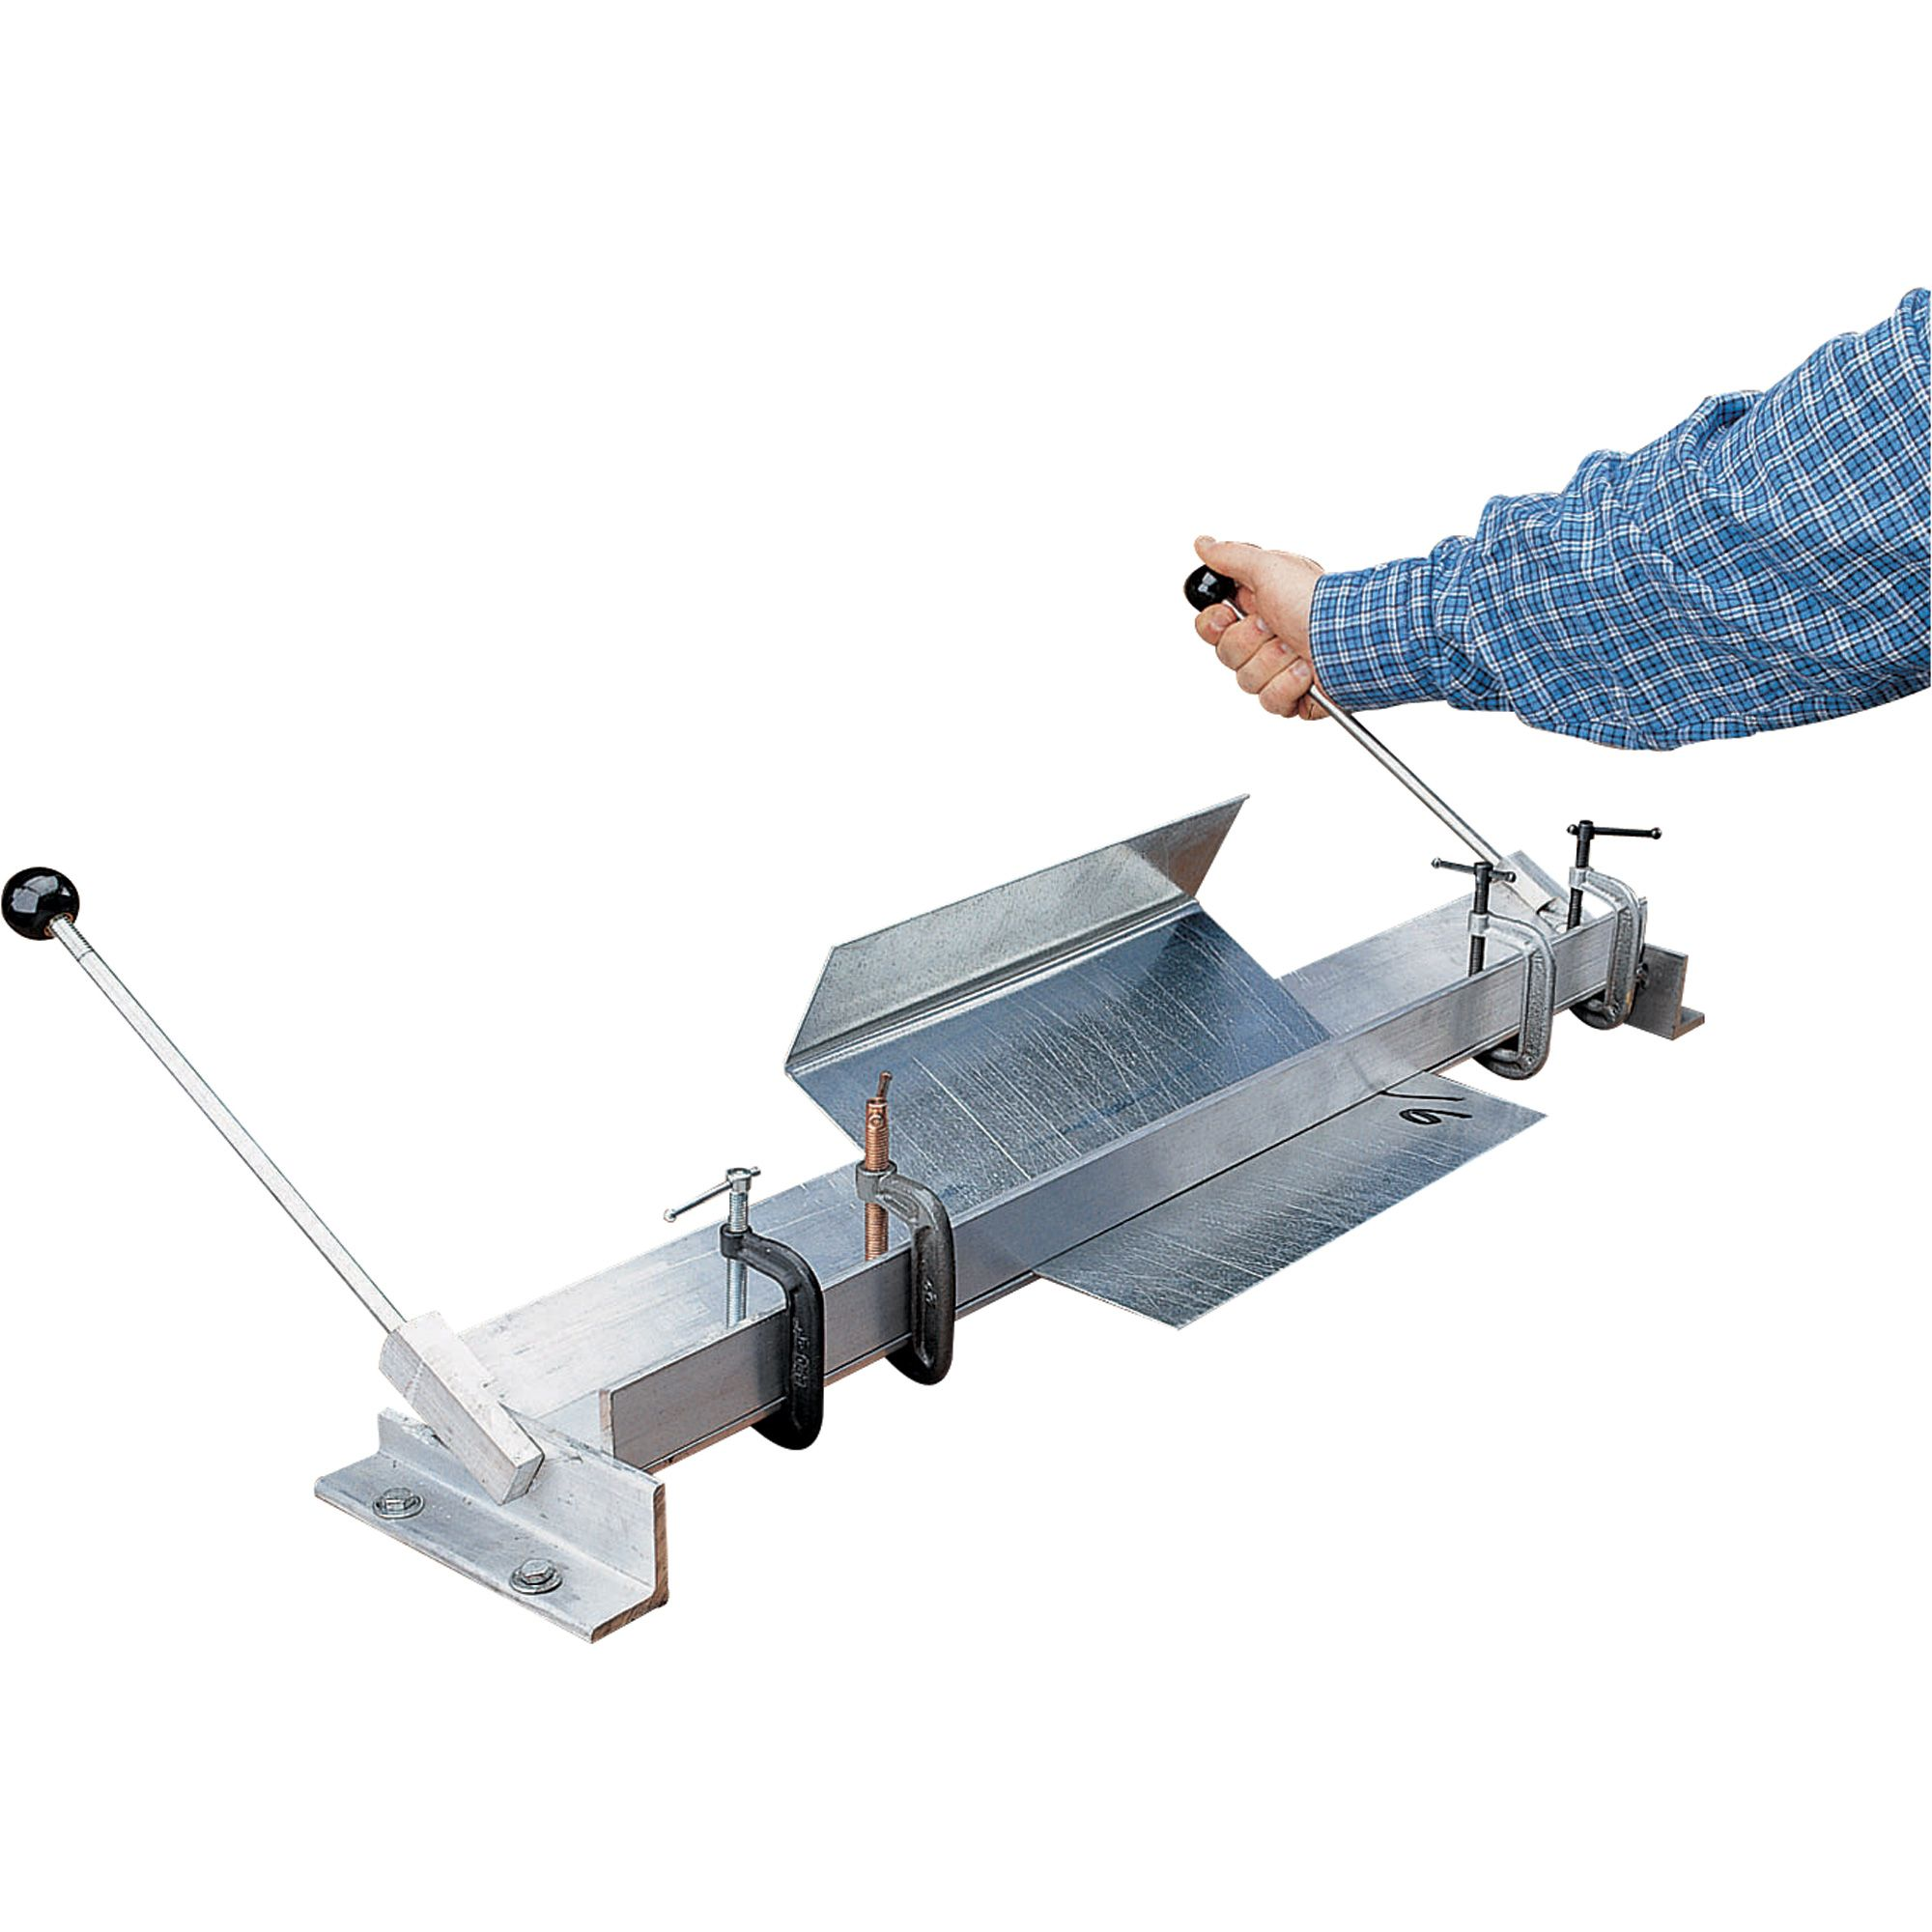 Homemade Metal Bending Machine Buscar Con Google Metal Working Tools Metal Tools Metal Bending